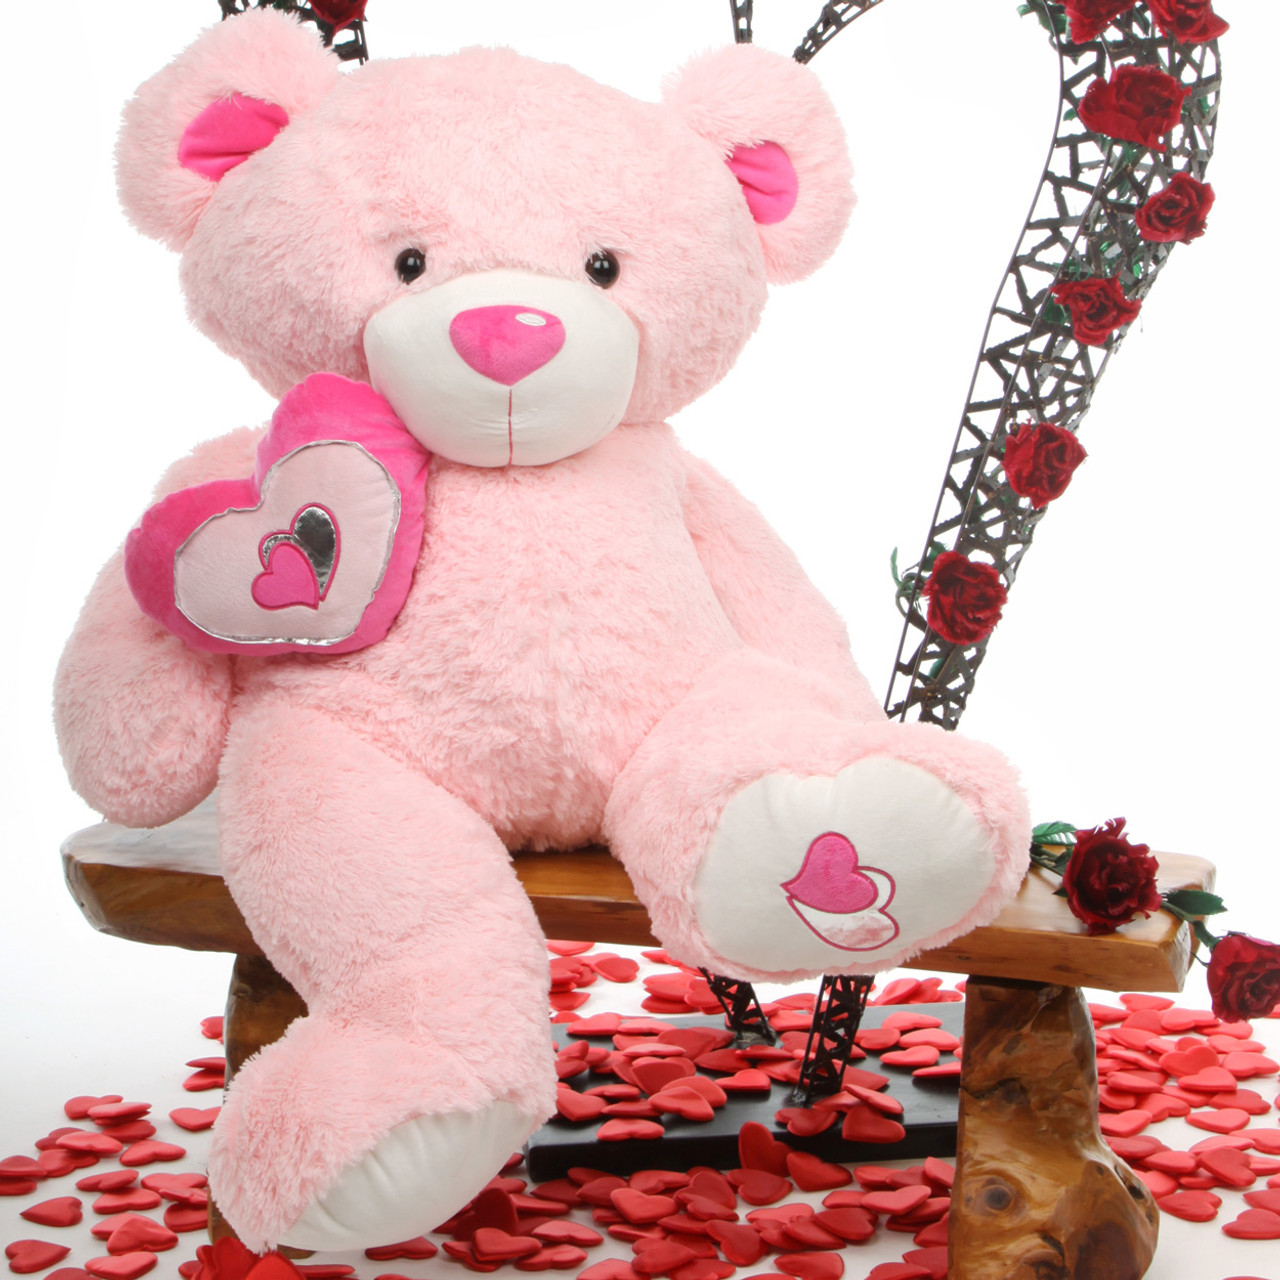 Cutie Pie Big Love 47 Jumbo Pink Plush Teddy Bear Giant Teddy Bear